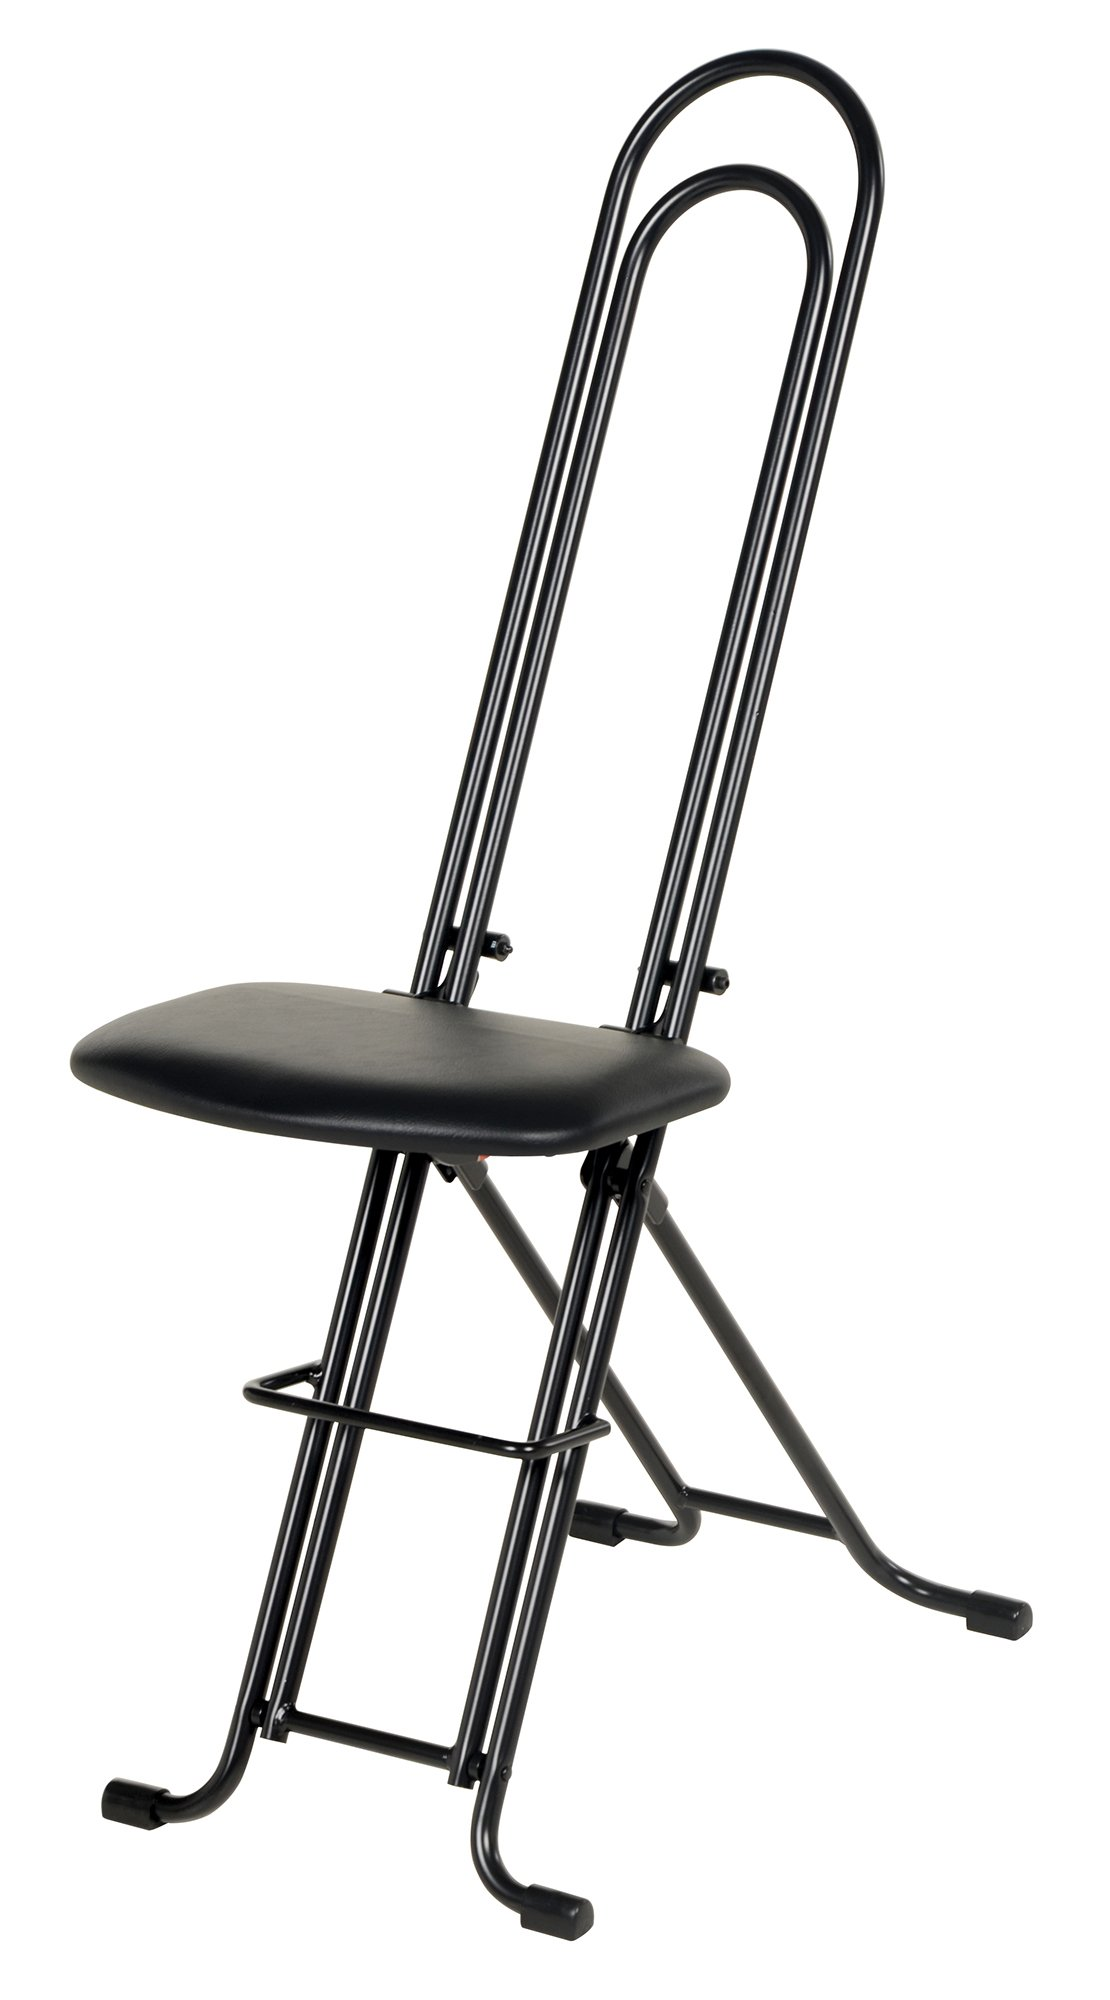 Vestil CPRO-800LP Ergonomic Worker Seat/Chair, 13-1/2'' Width, 10'' Depth, 300 lb. Capacity, 18'' - 33'' Height Range by Vestil (Image #1)